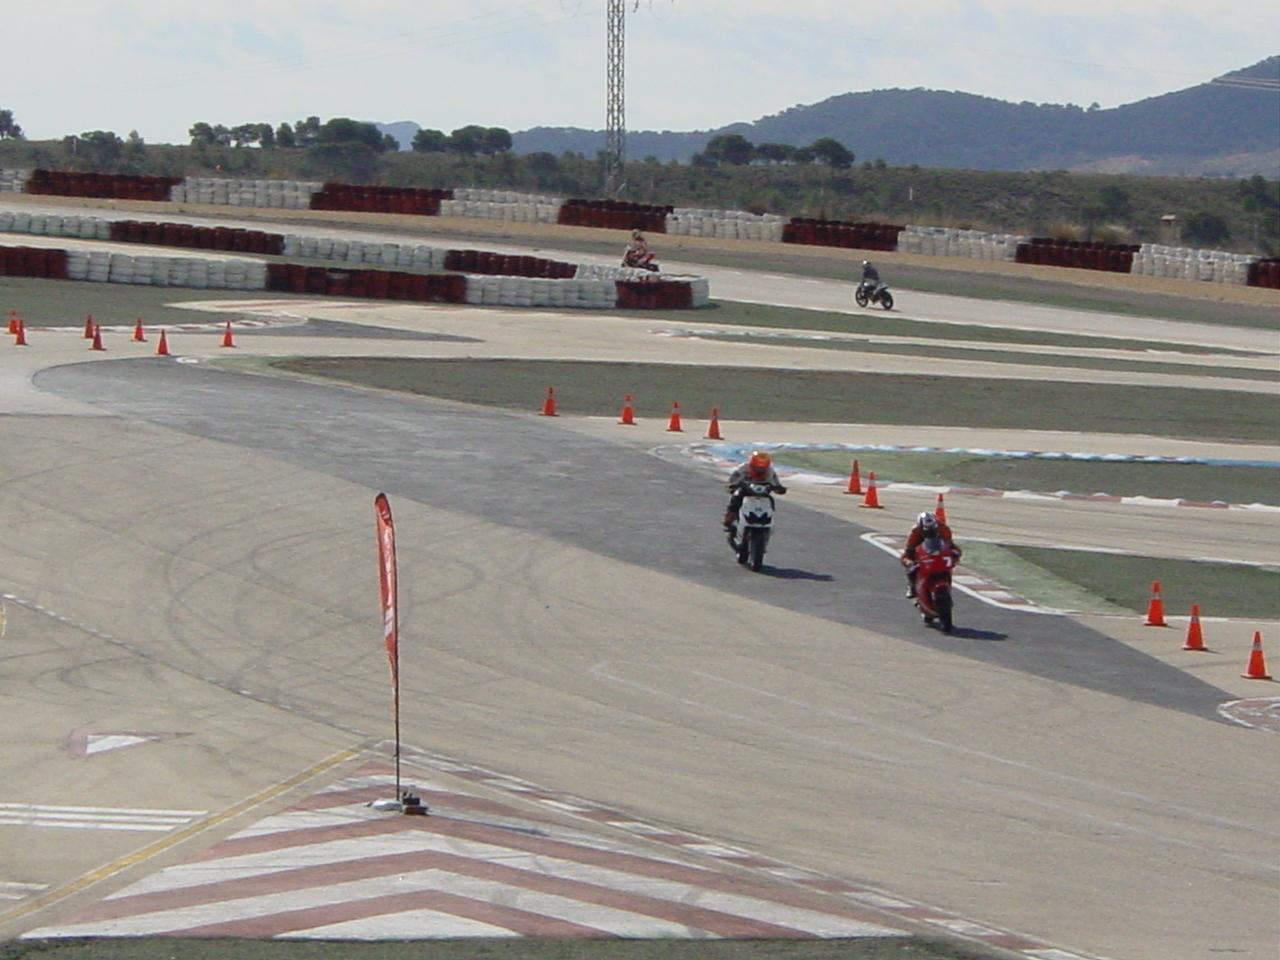 Circuito Jumilla : Circuito internacional de jumilla: copa levante imr racing en